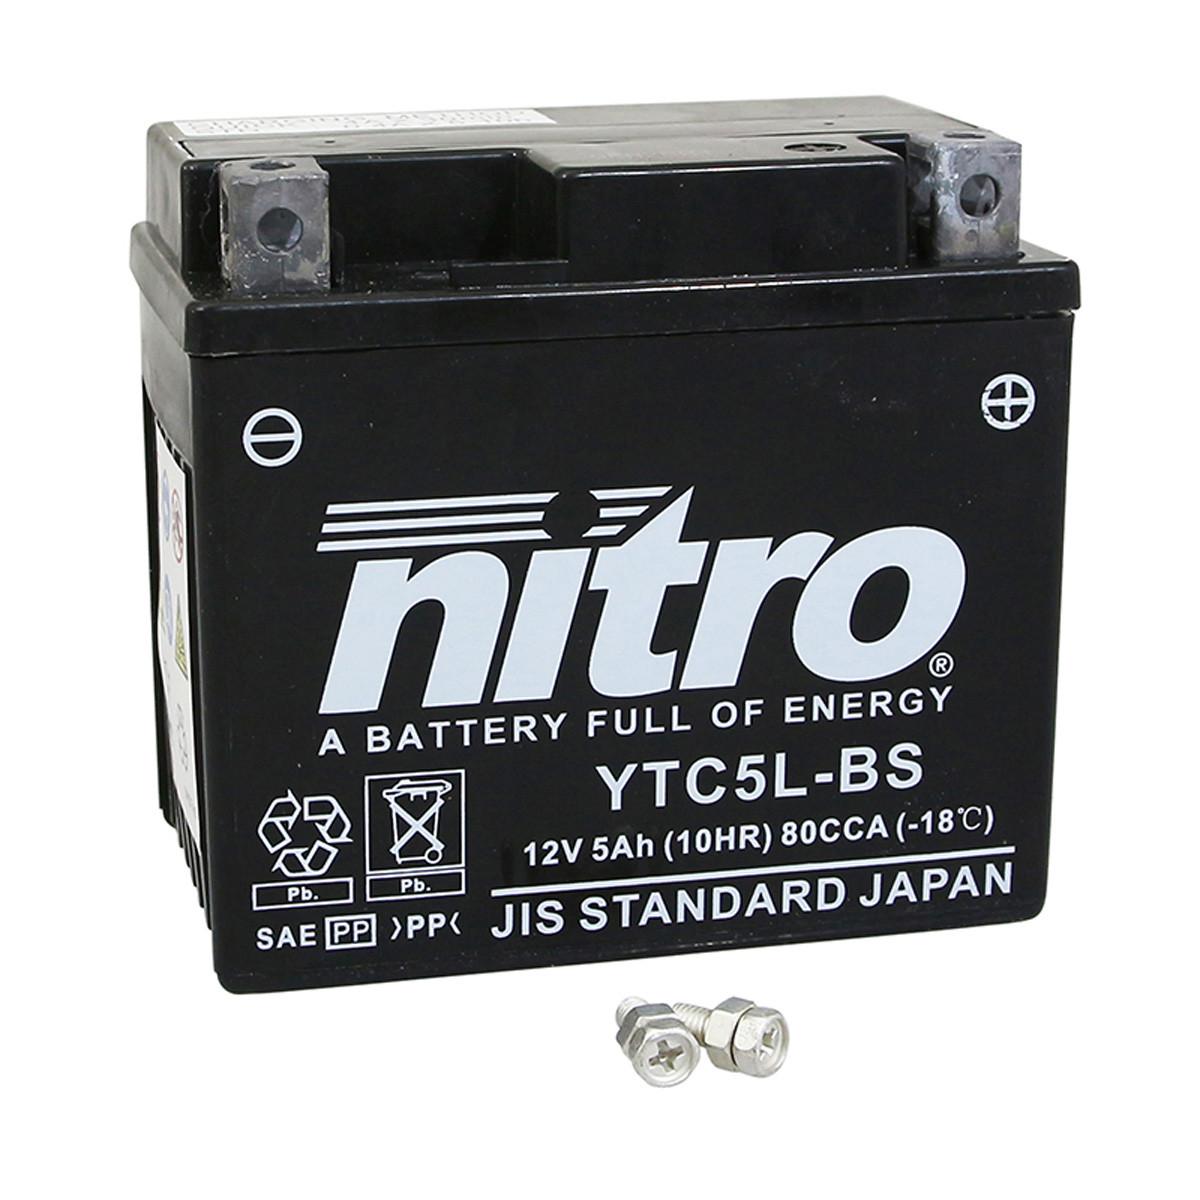 Batterie 12V 5Ah YTC5LB - NITRO sans entretien au Gel